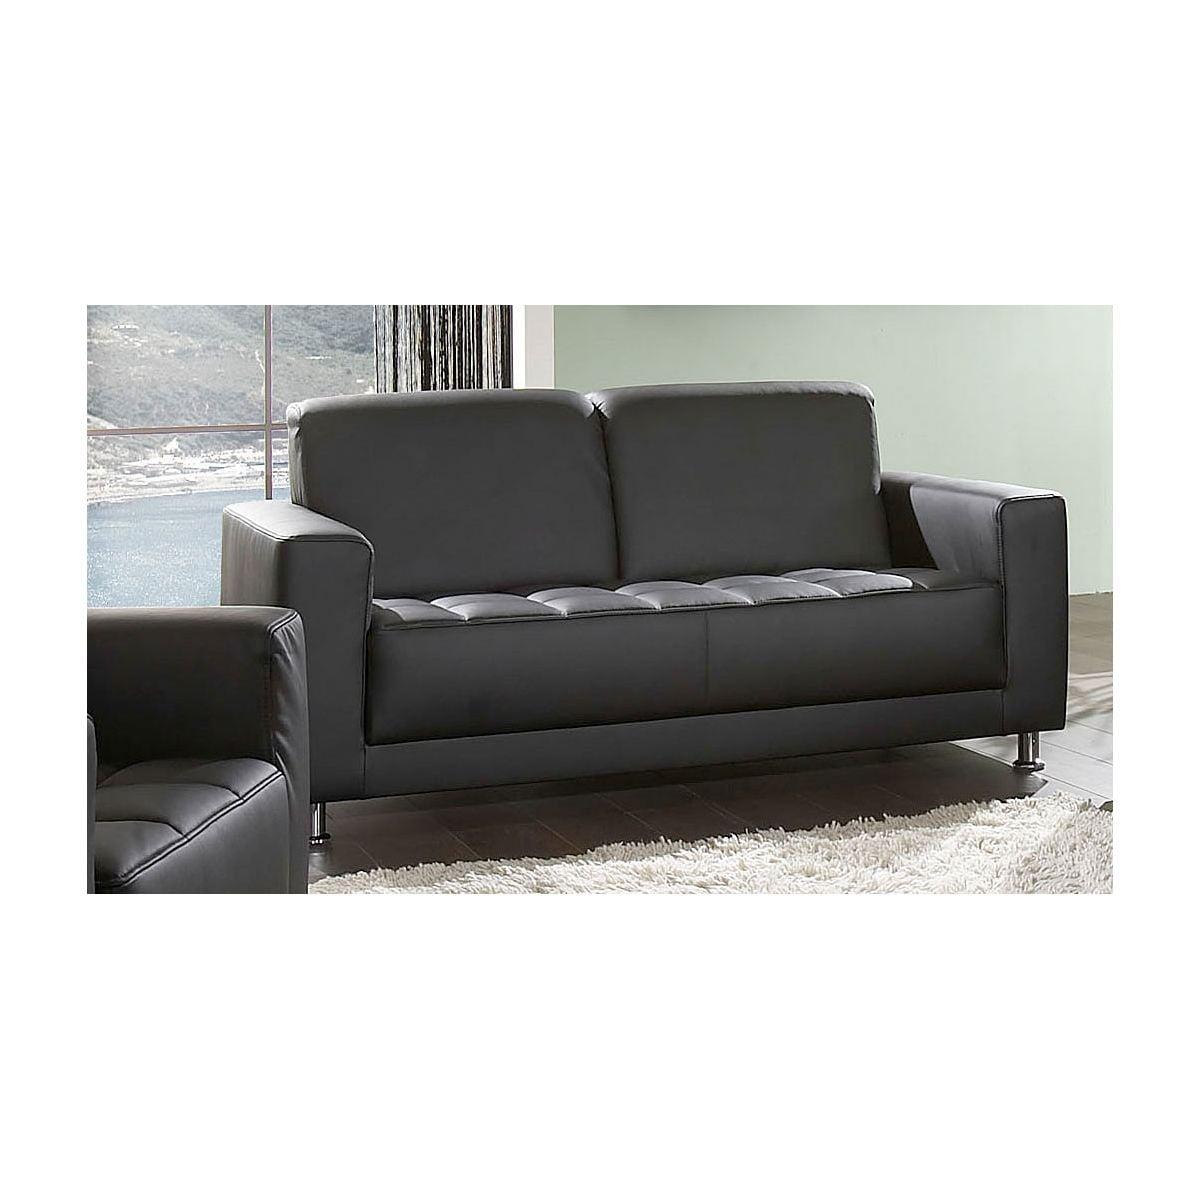 sofa alessandro lederlook schwarz porta. Black Bedroom Furniture Sets. Home Design Ideas